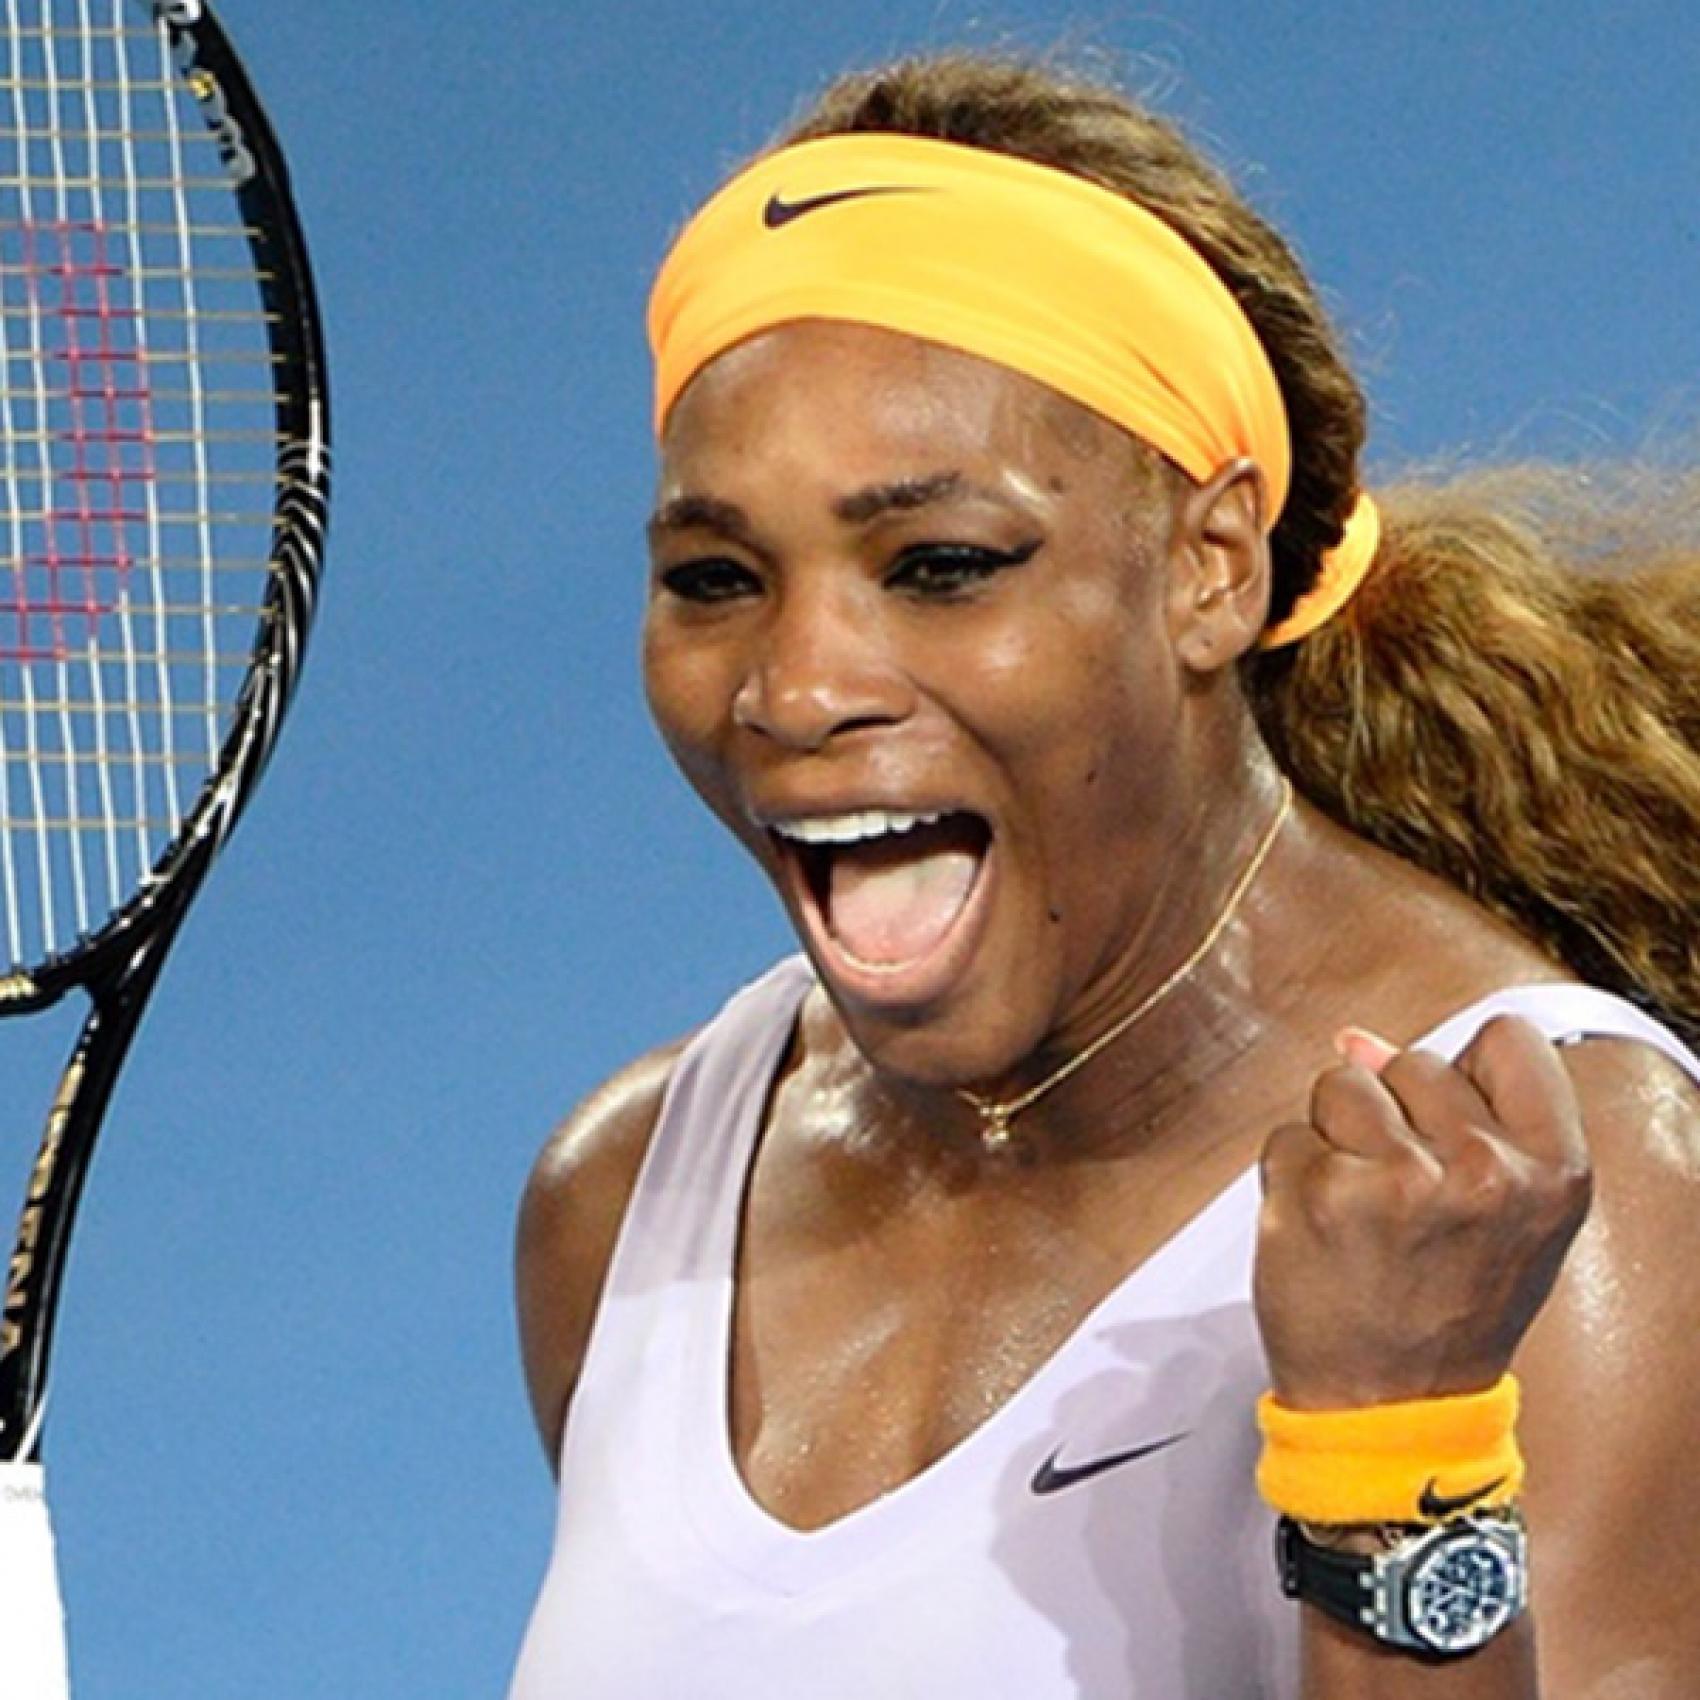 Serena Williams Img Academy